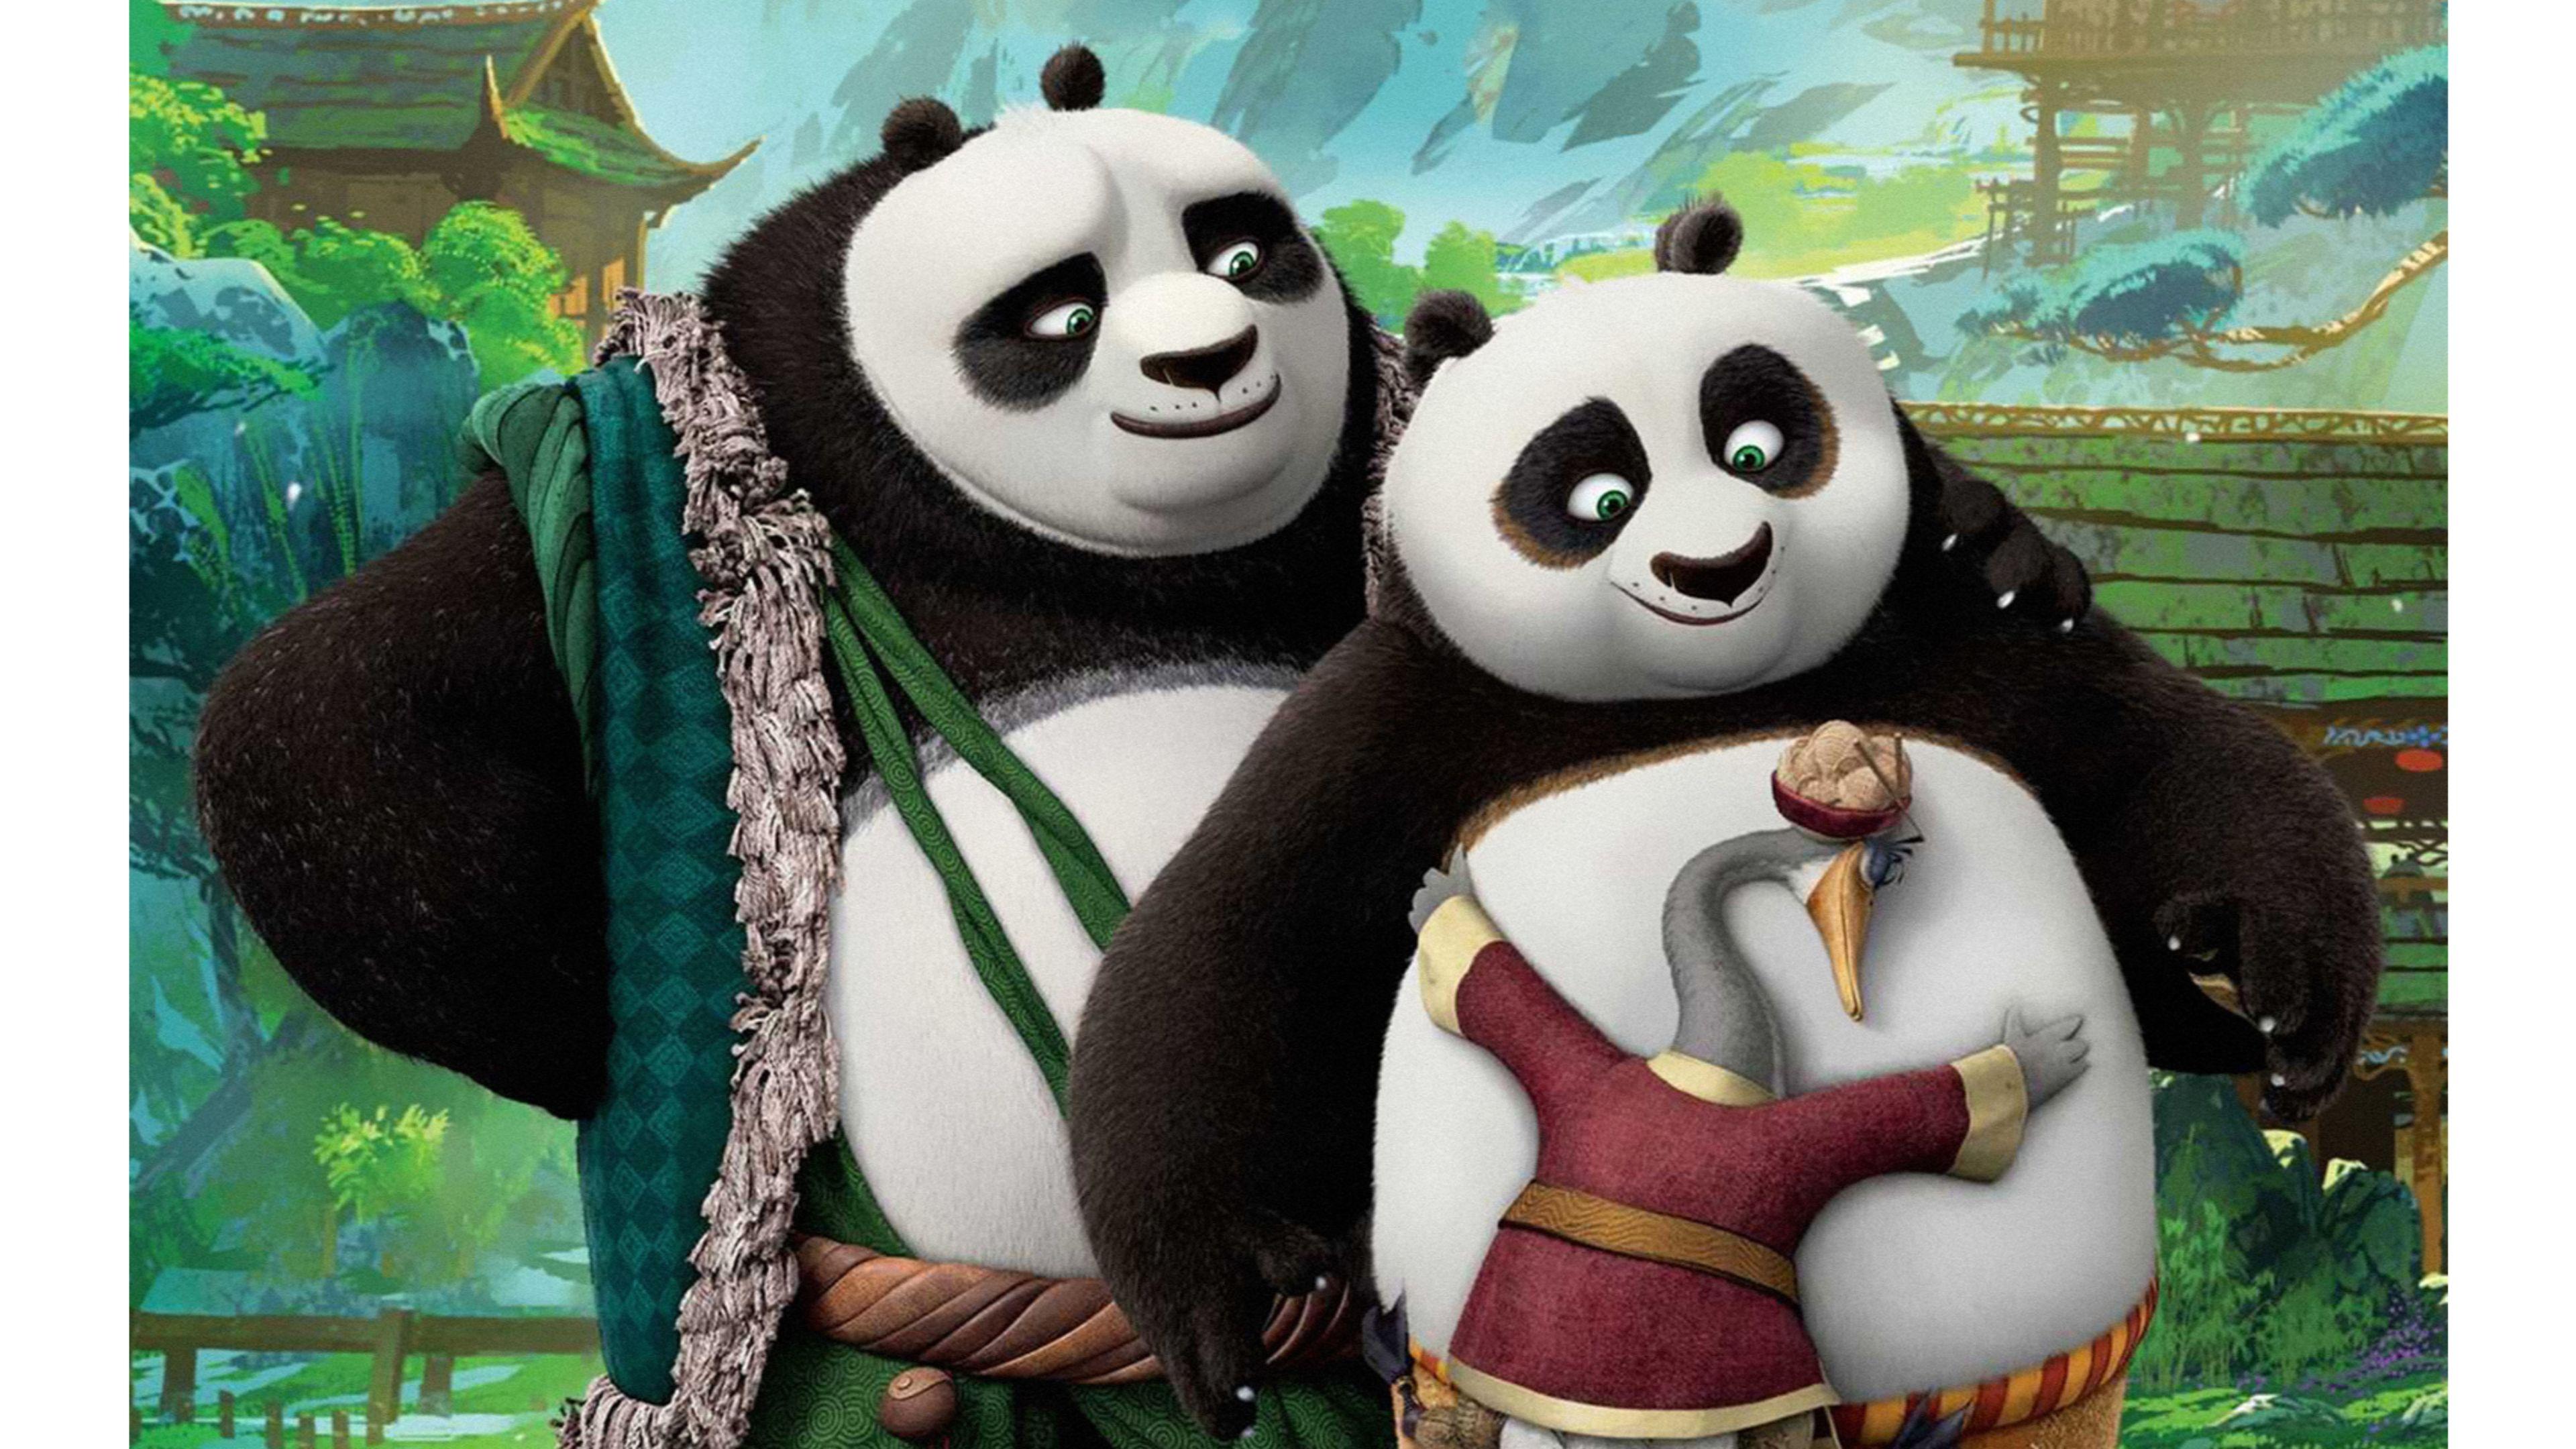 Kung wallpapers photos and desktop backgrounds up to 8k - Kung fu panda wallpaper ...